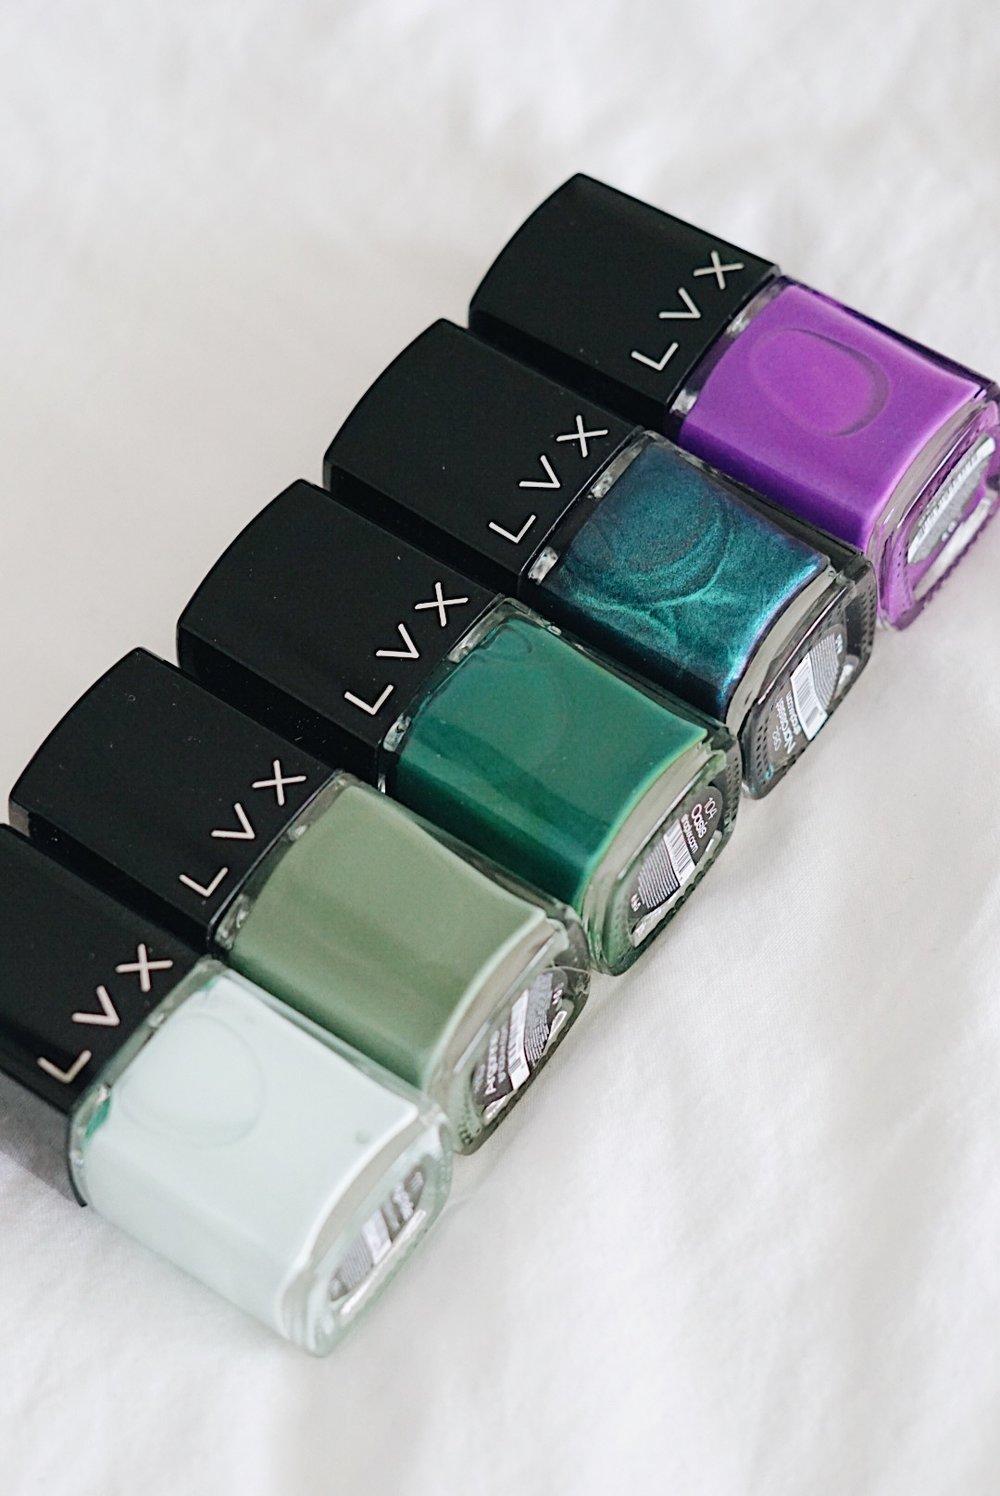 LVX-Nail-Polish-7-Free-seven-free